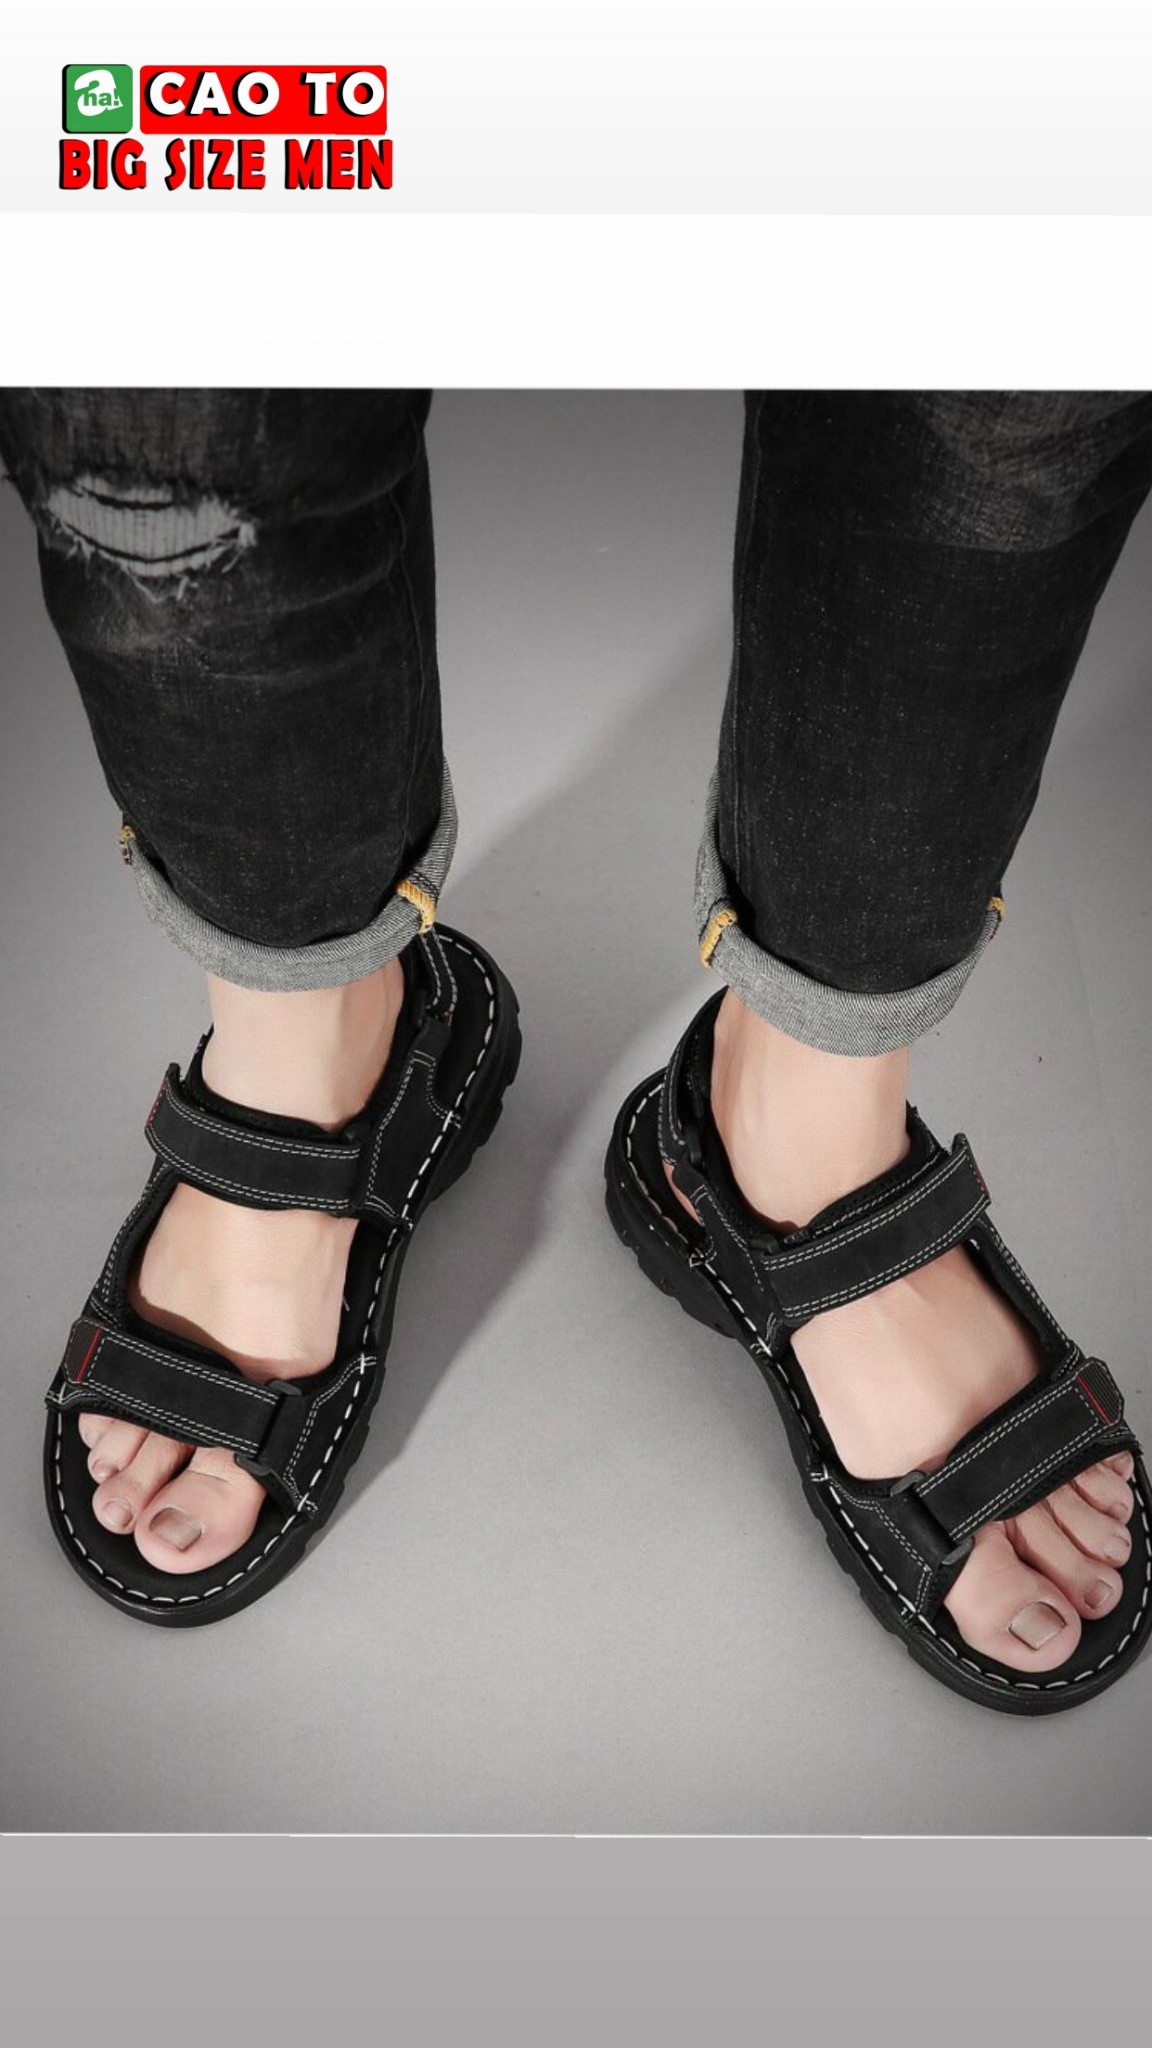 giày sandal nam big size đen 45 46 47 48 49